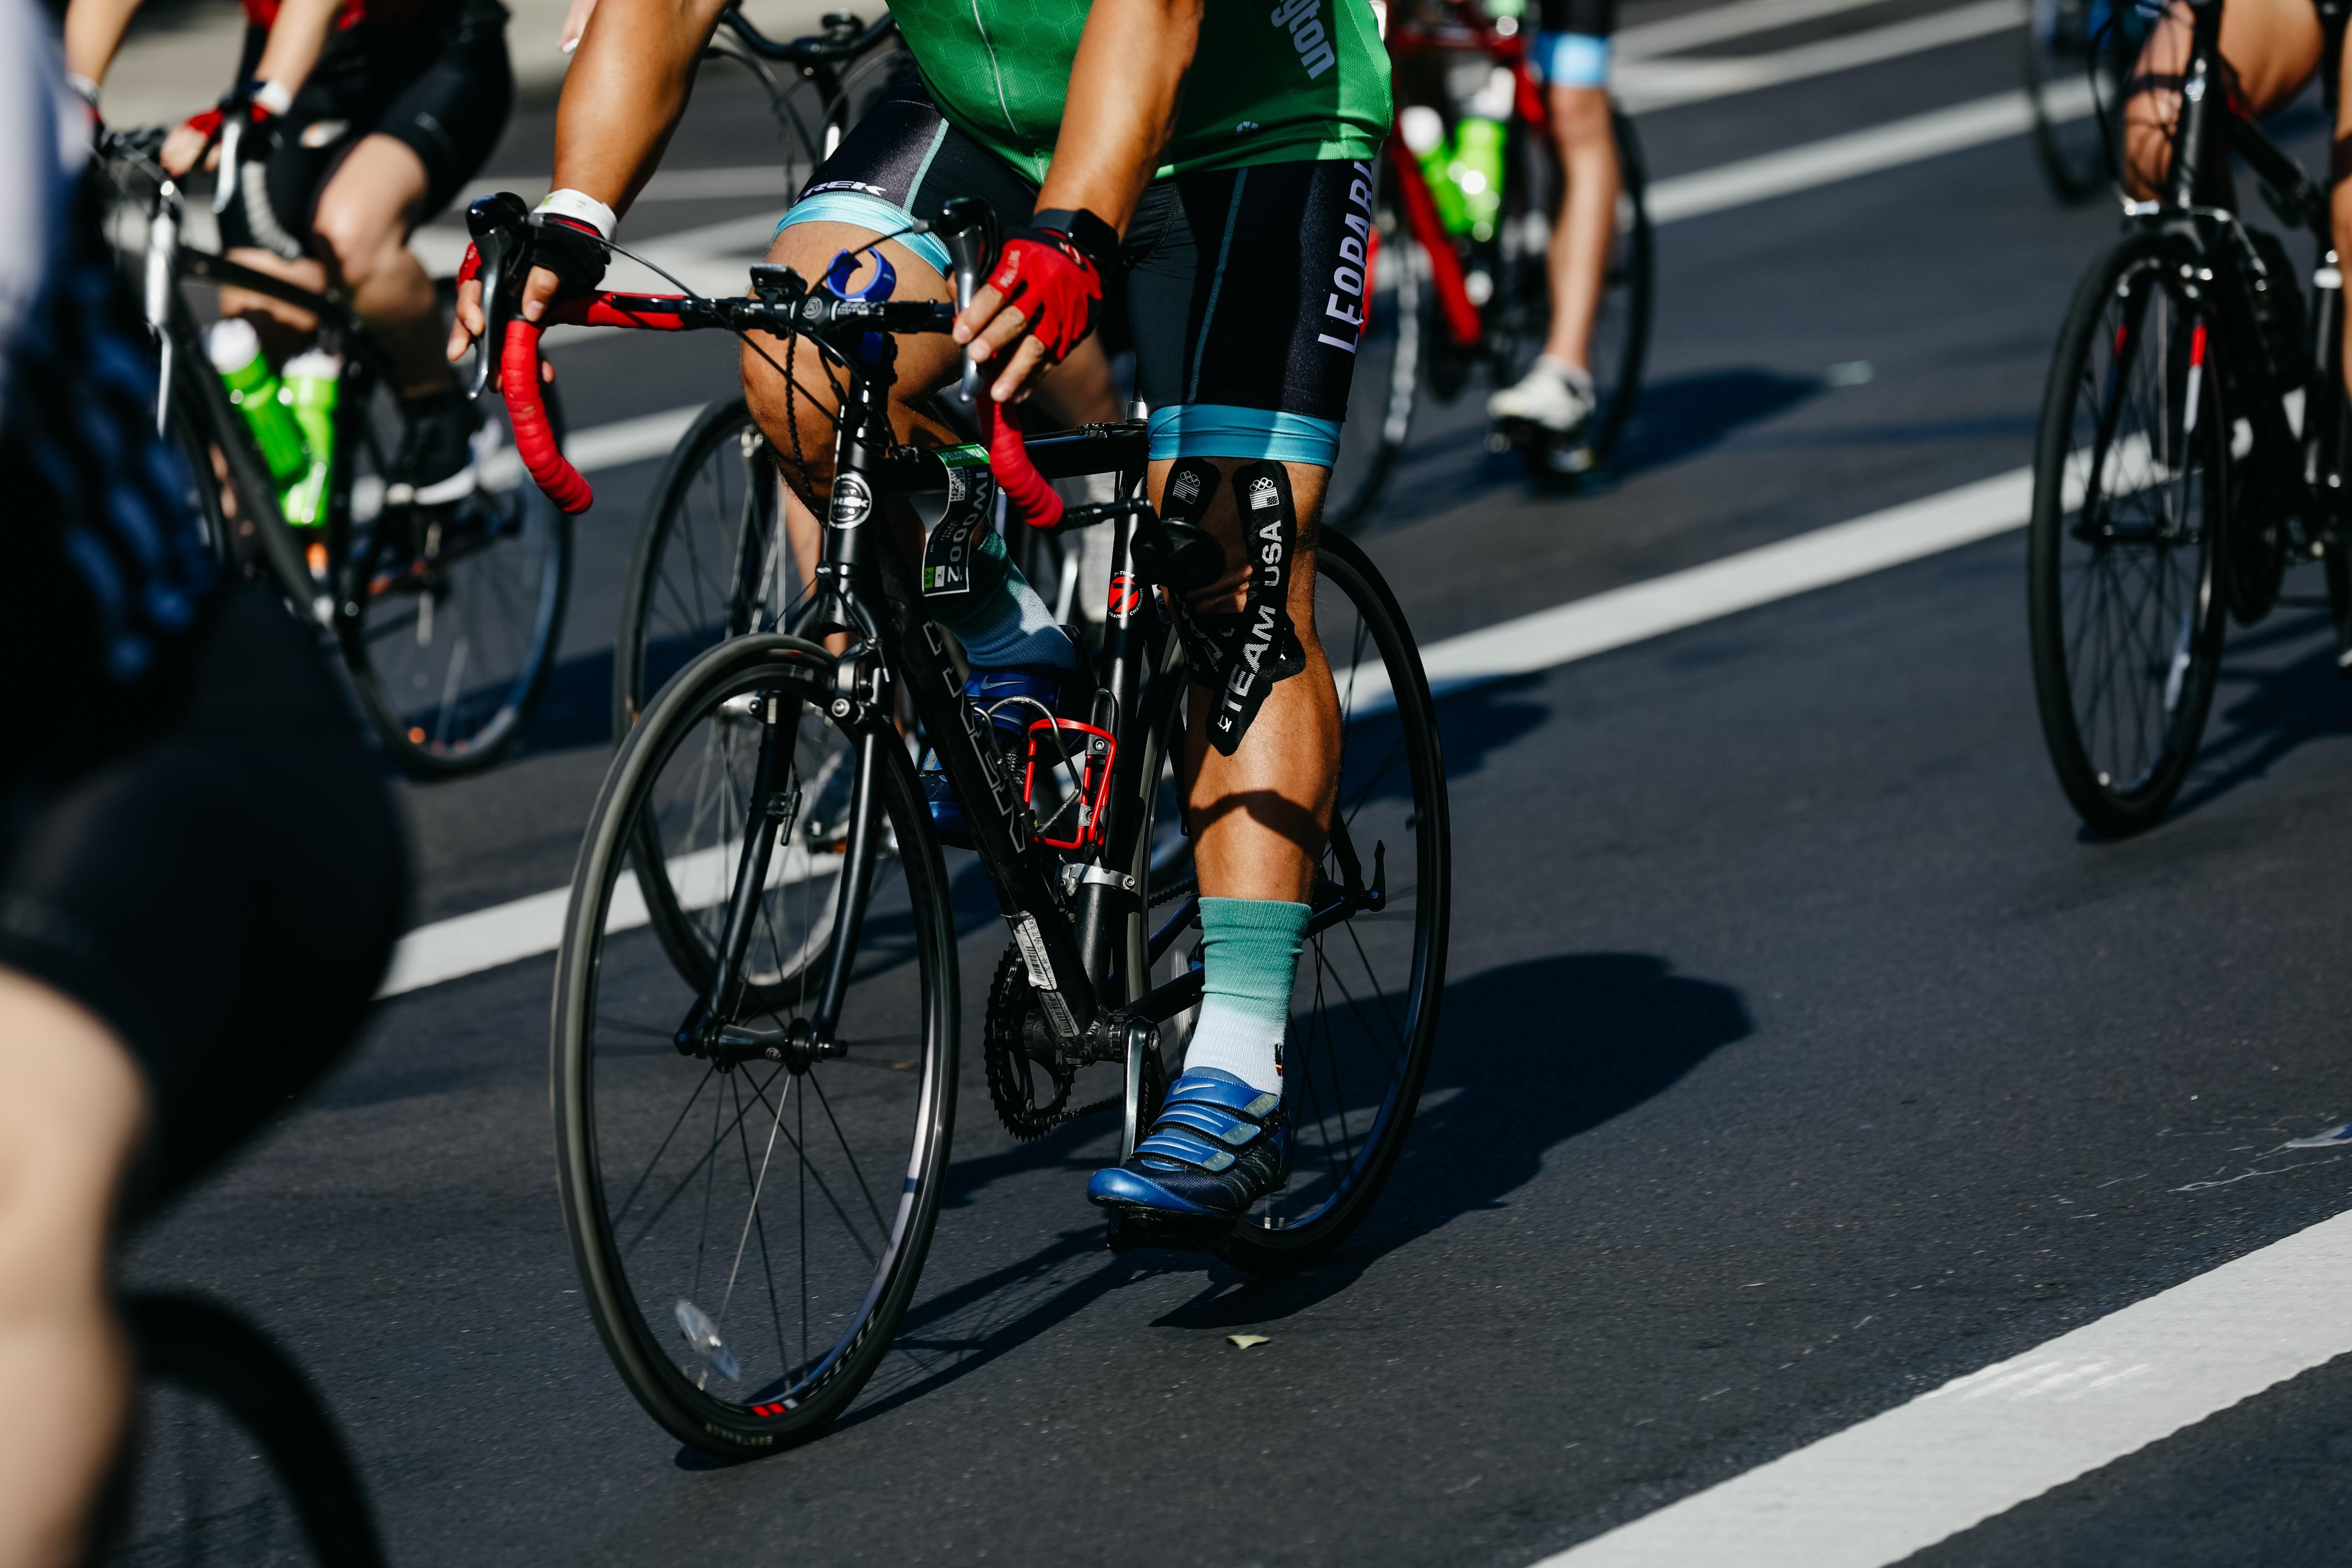 Pelotonia Charity Biking Event